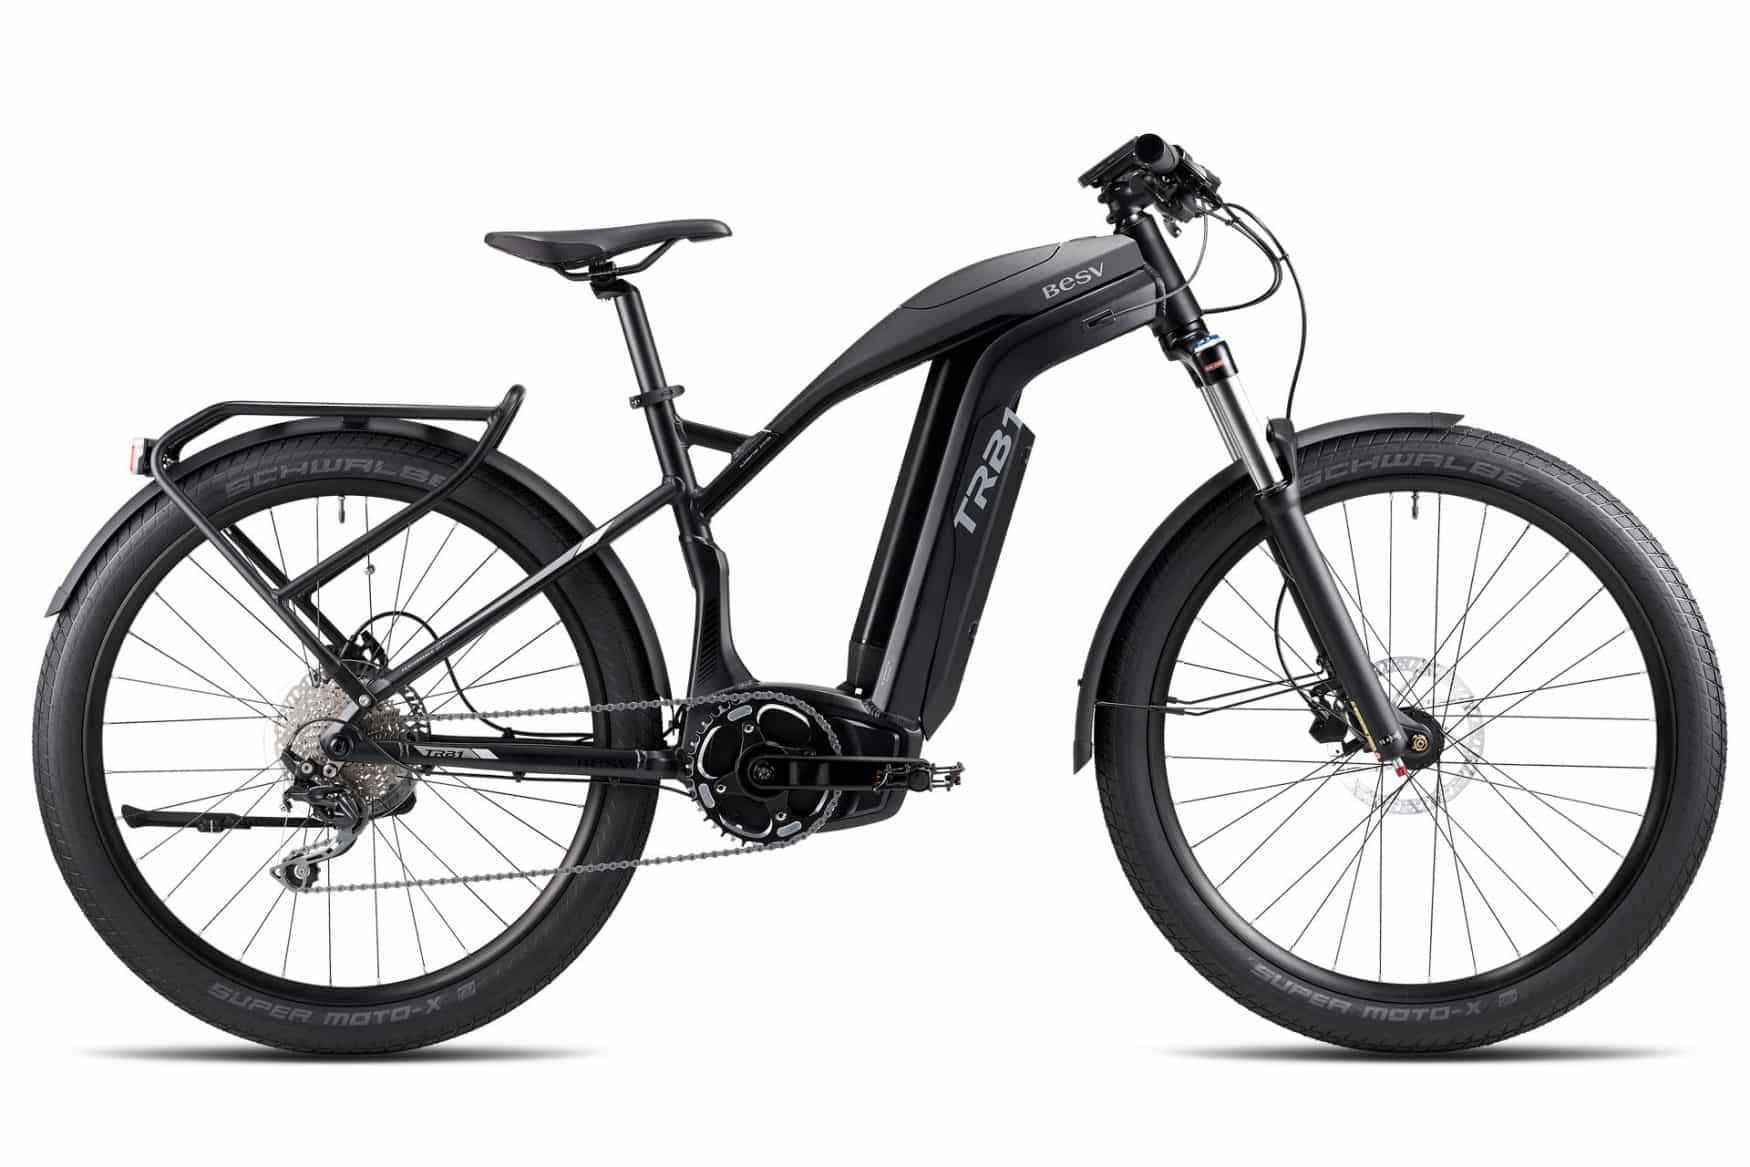 Urban e-bike TRB1 Urban|BESV